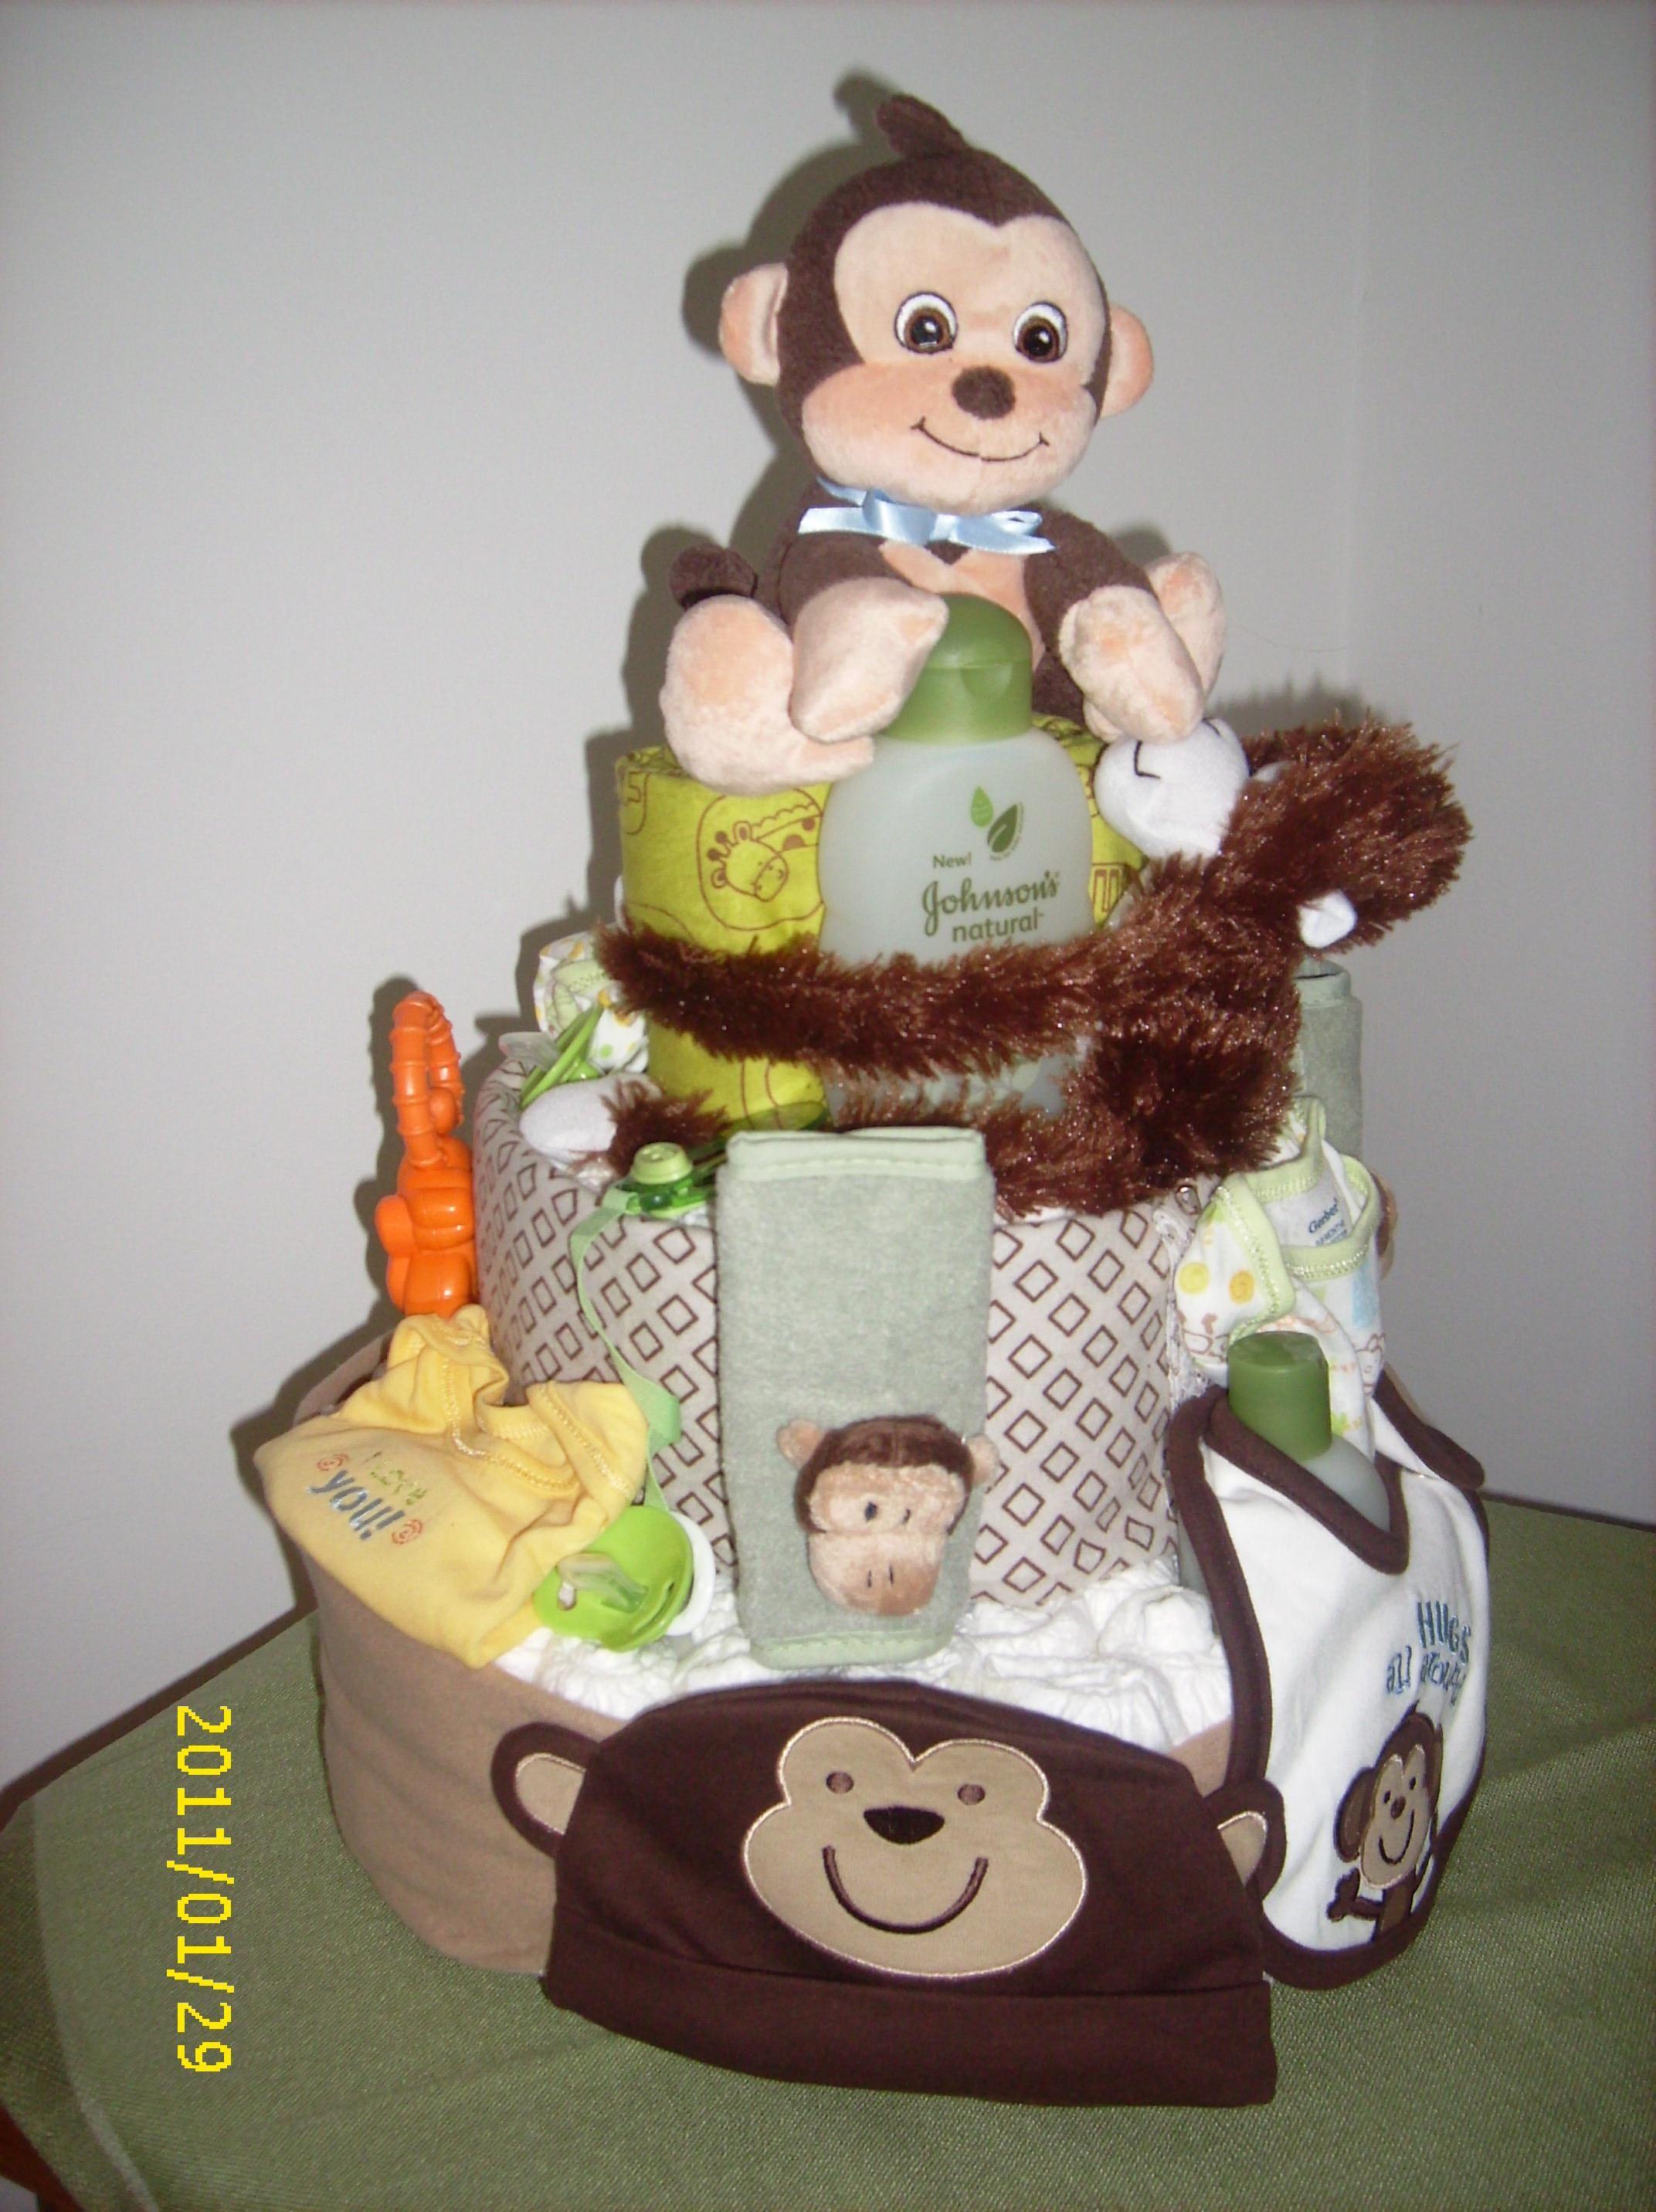 Monkey theme diaper cake for baby shower babies pinterest - Baby shower cakes monkey theme ...